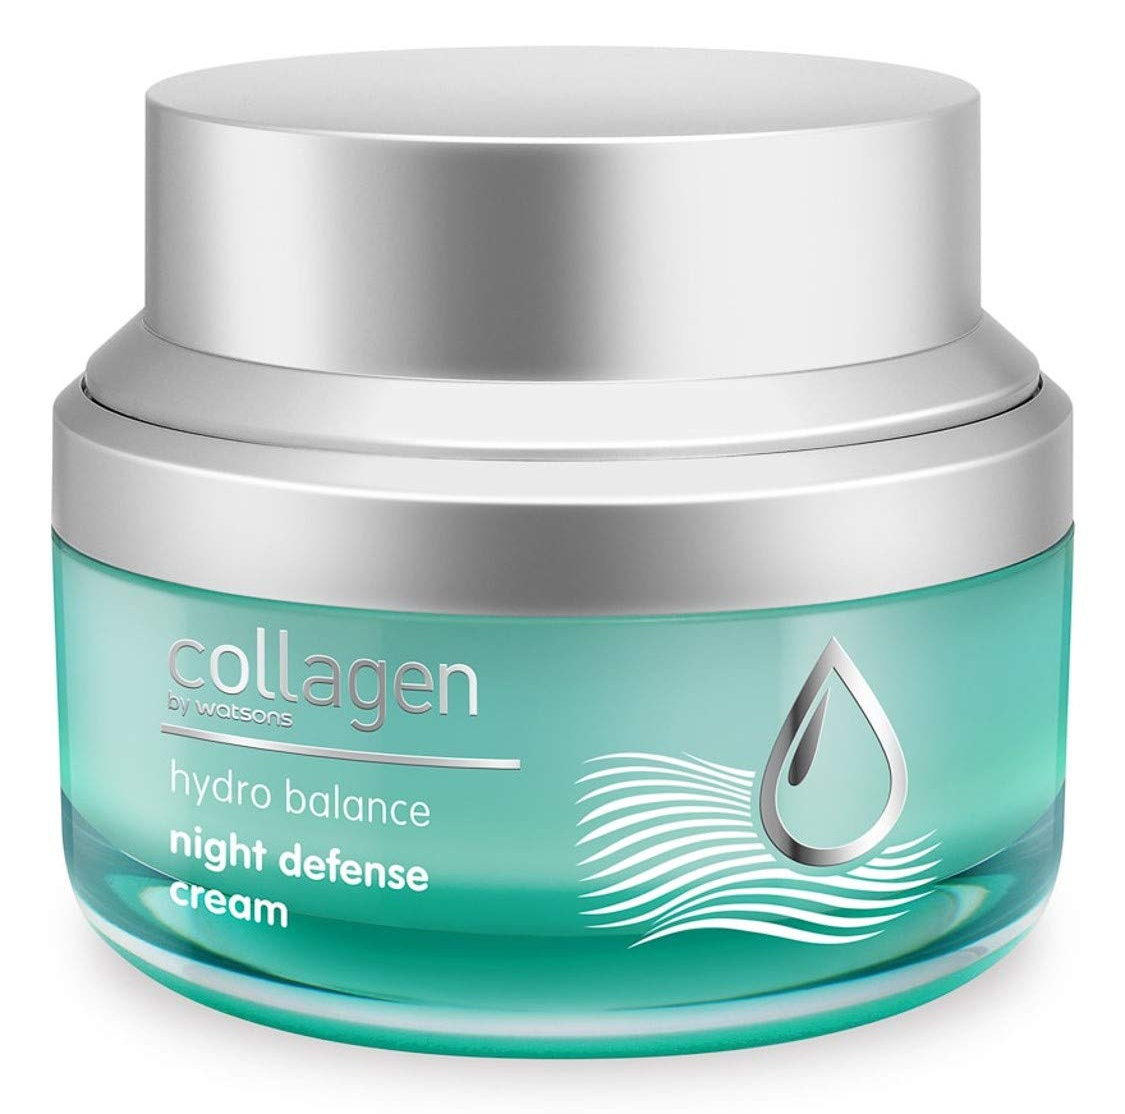 Watsons Collagen By Watsons Hydro Balance Night Defense Cream